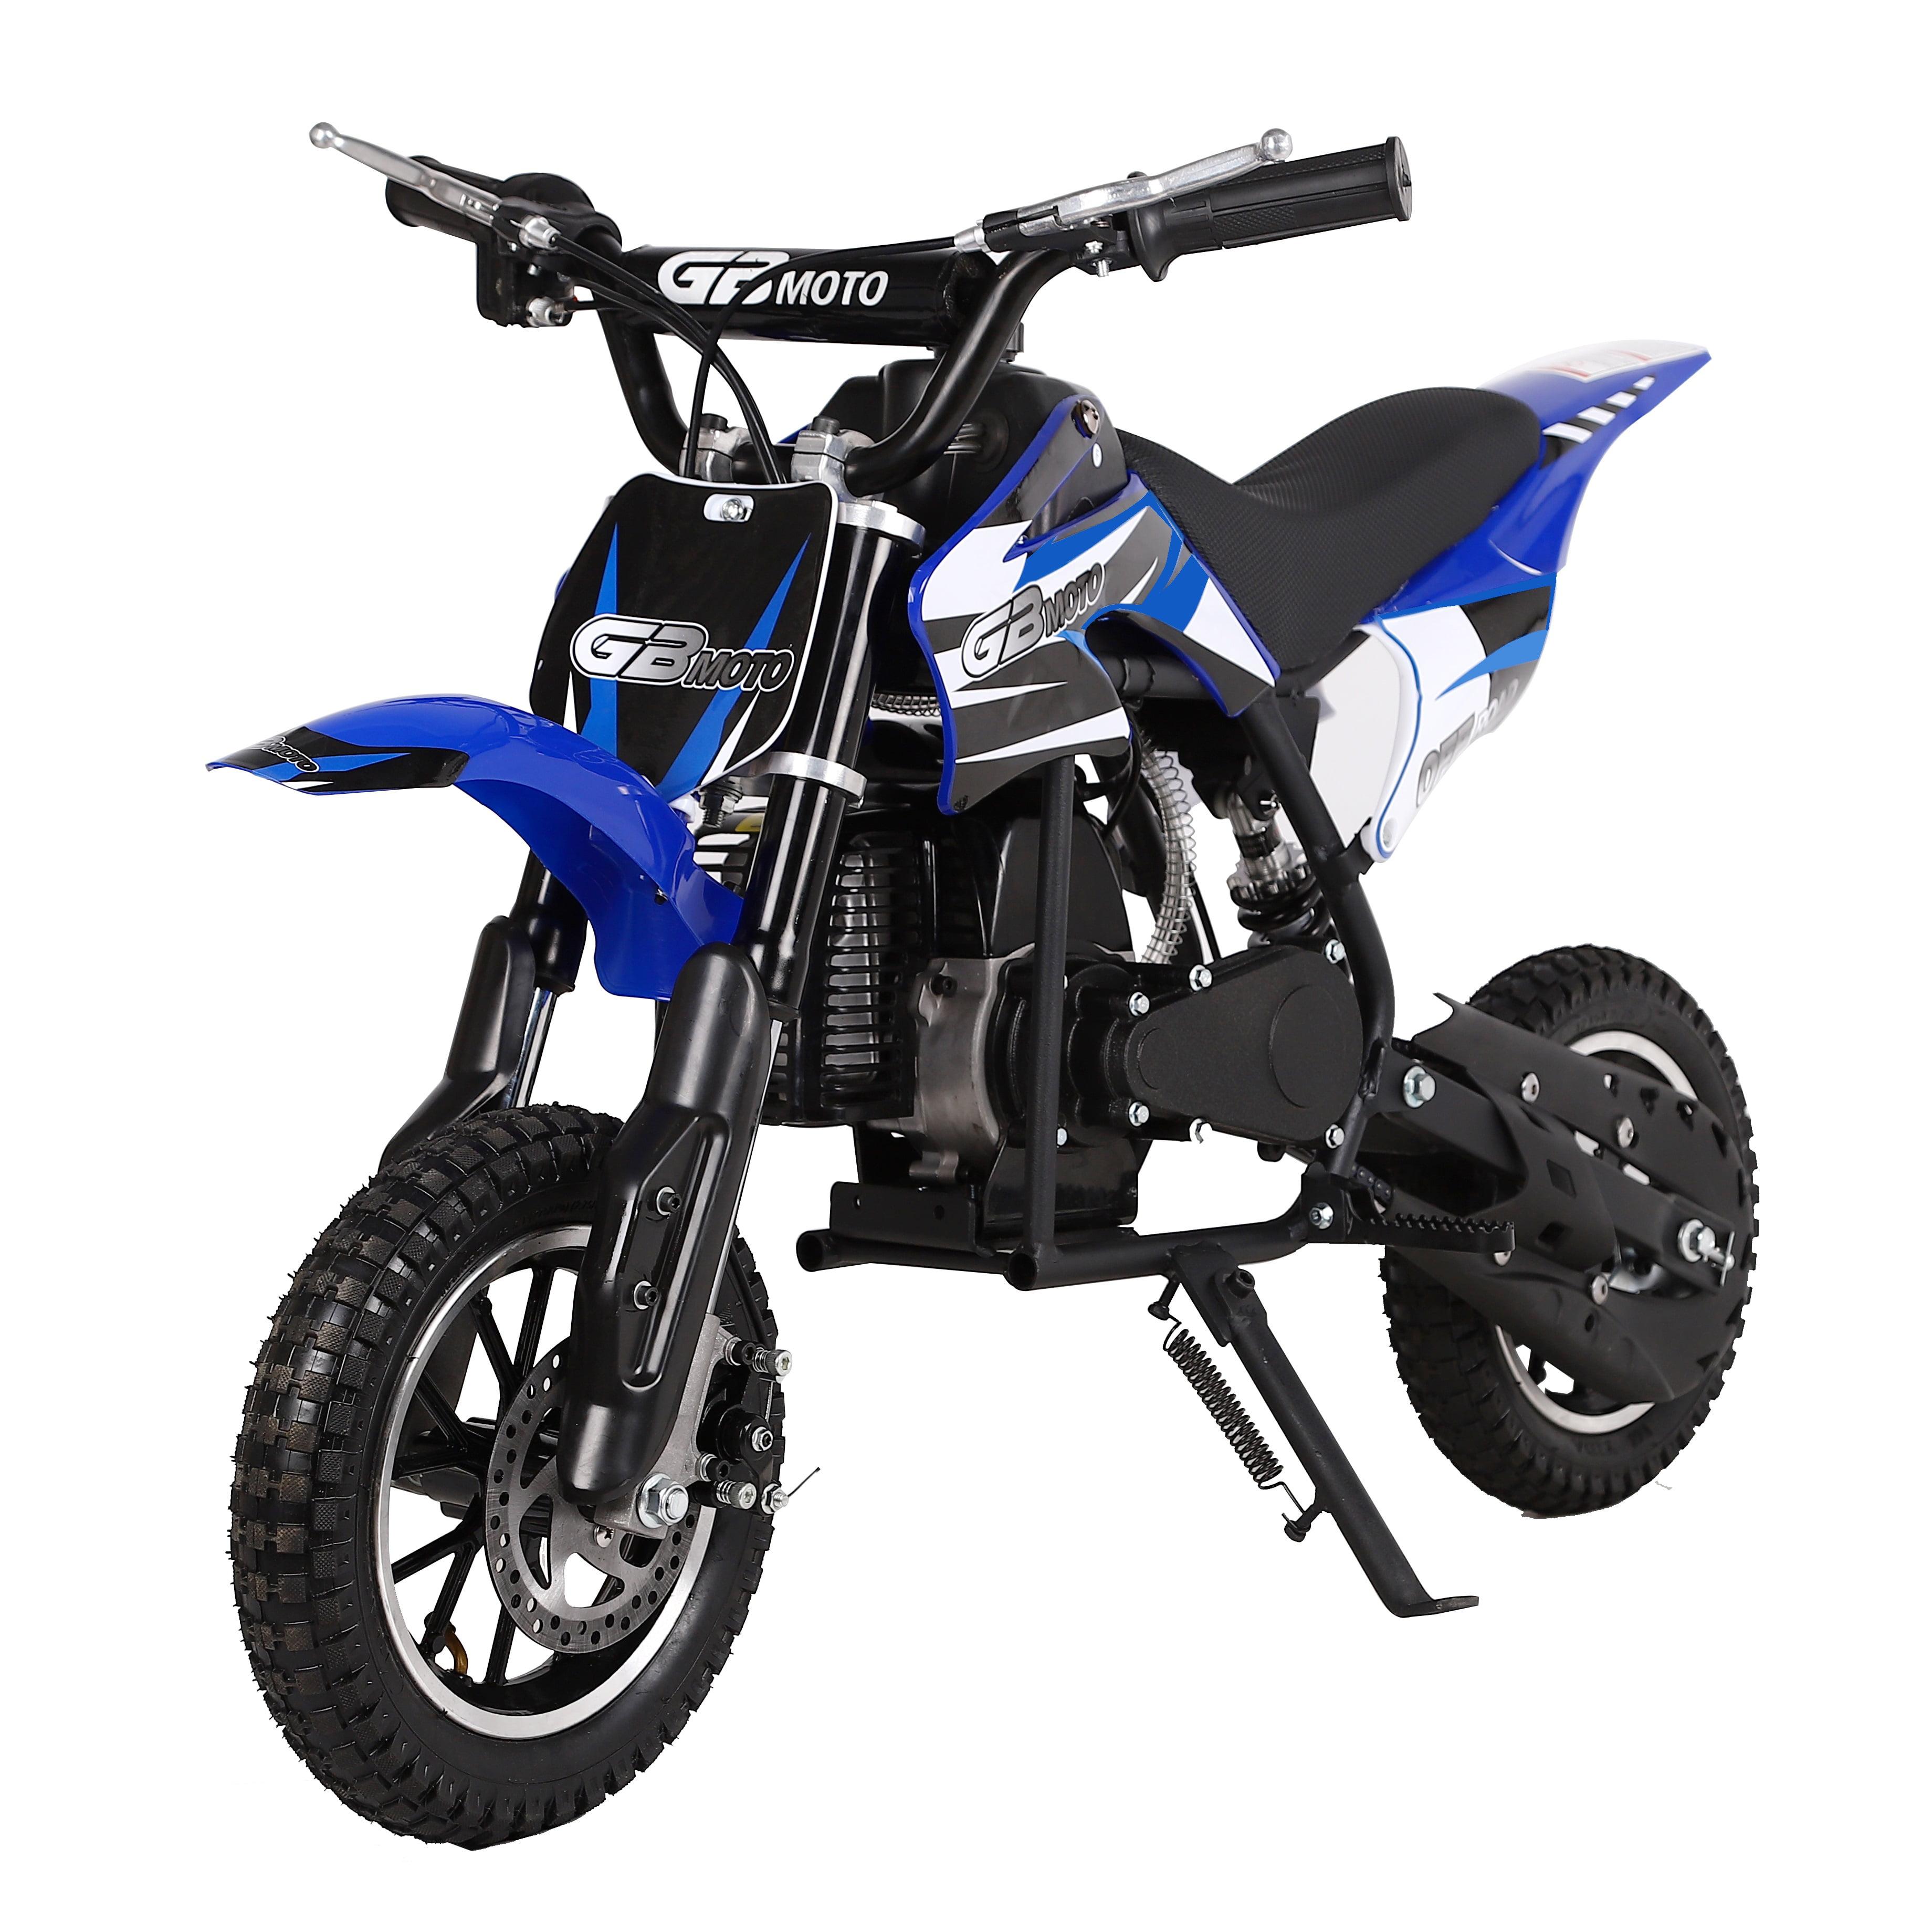 v fire the dakar 49cc 2 stroke gas motor dirt bike kids. Black Bedroom Furniture Sets. Home Design Ideas